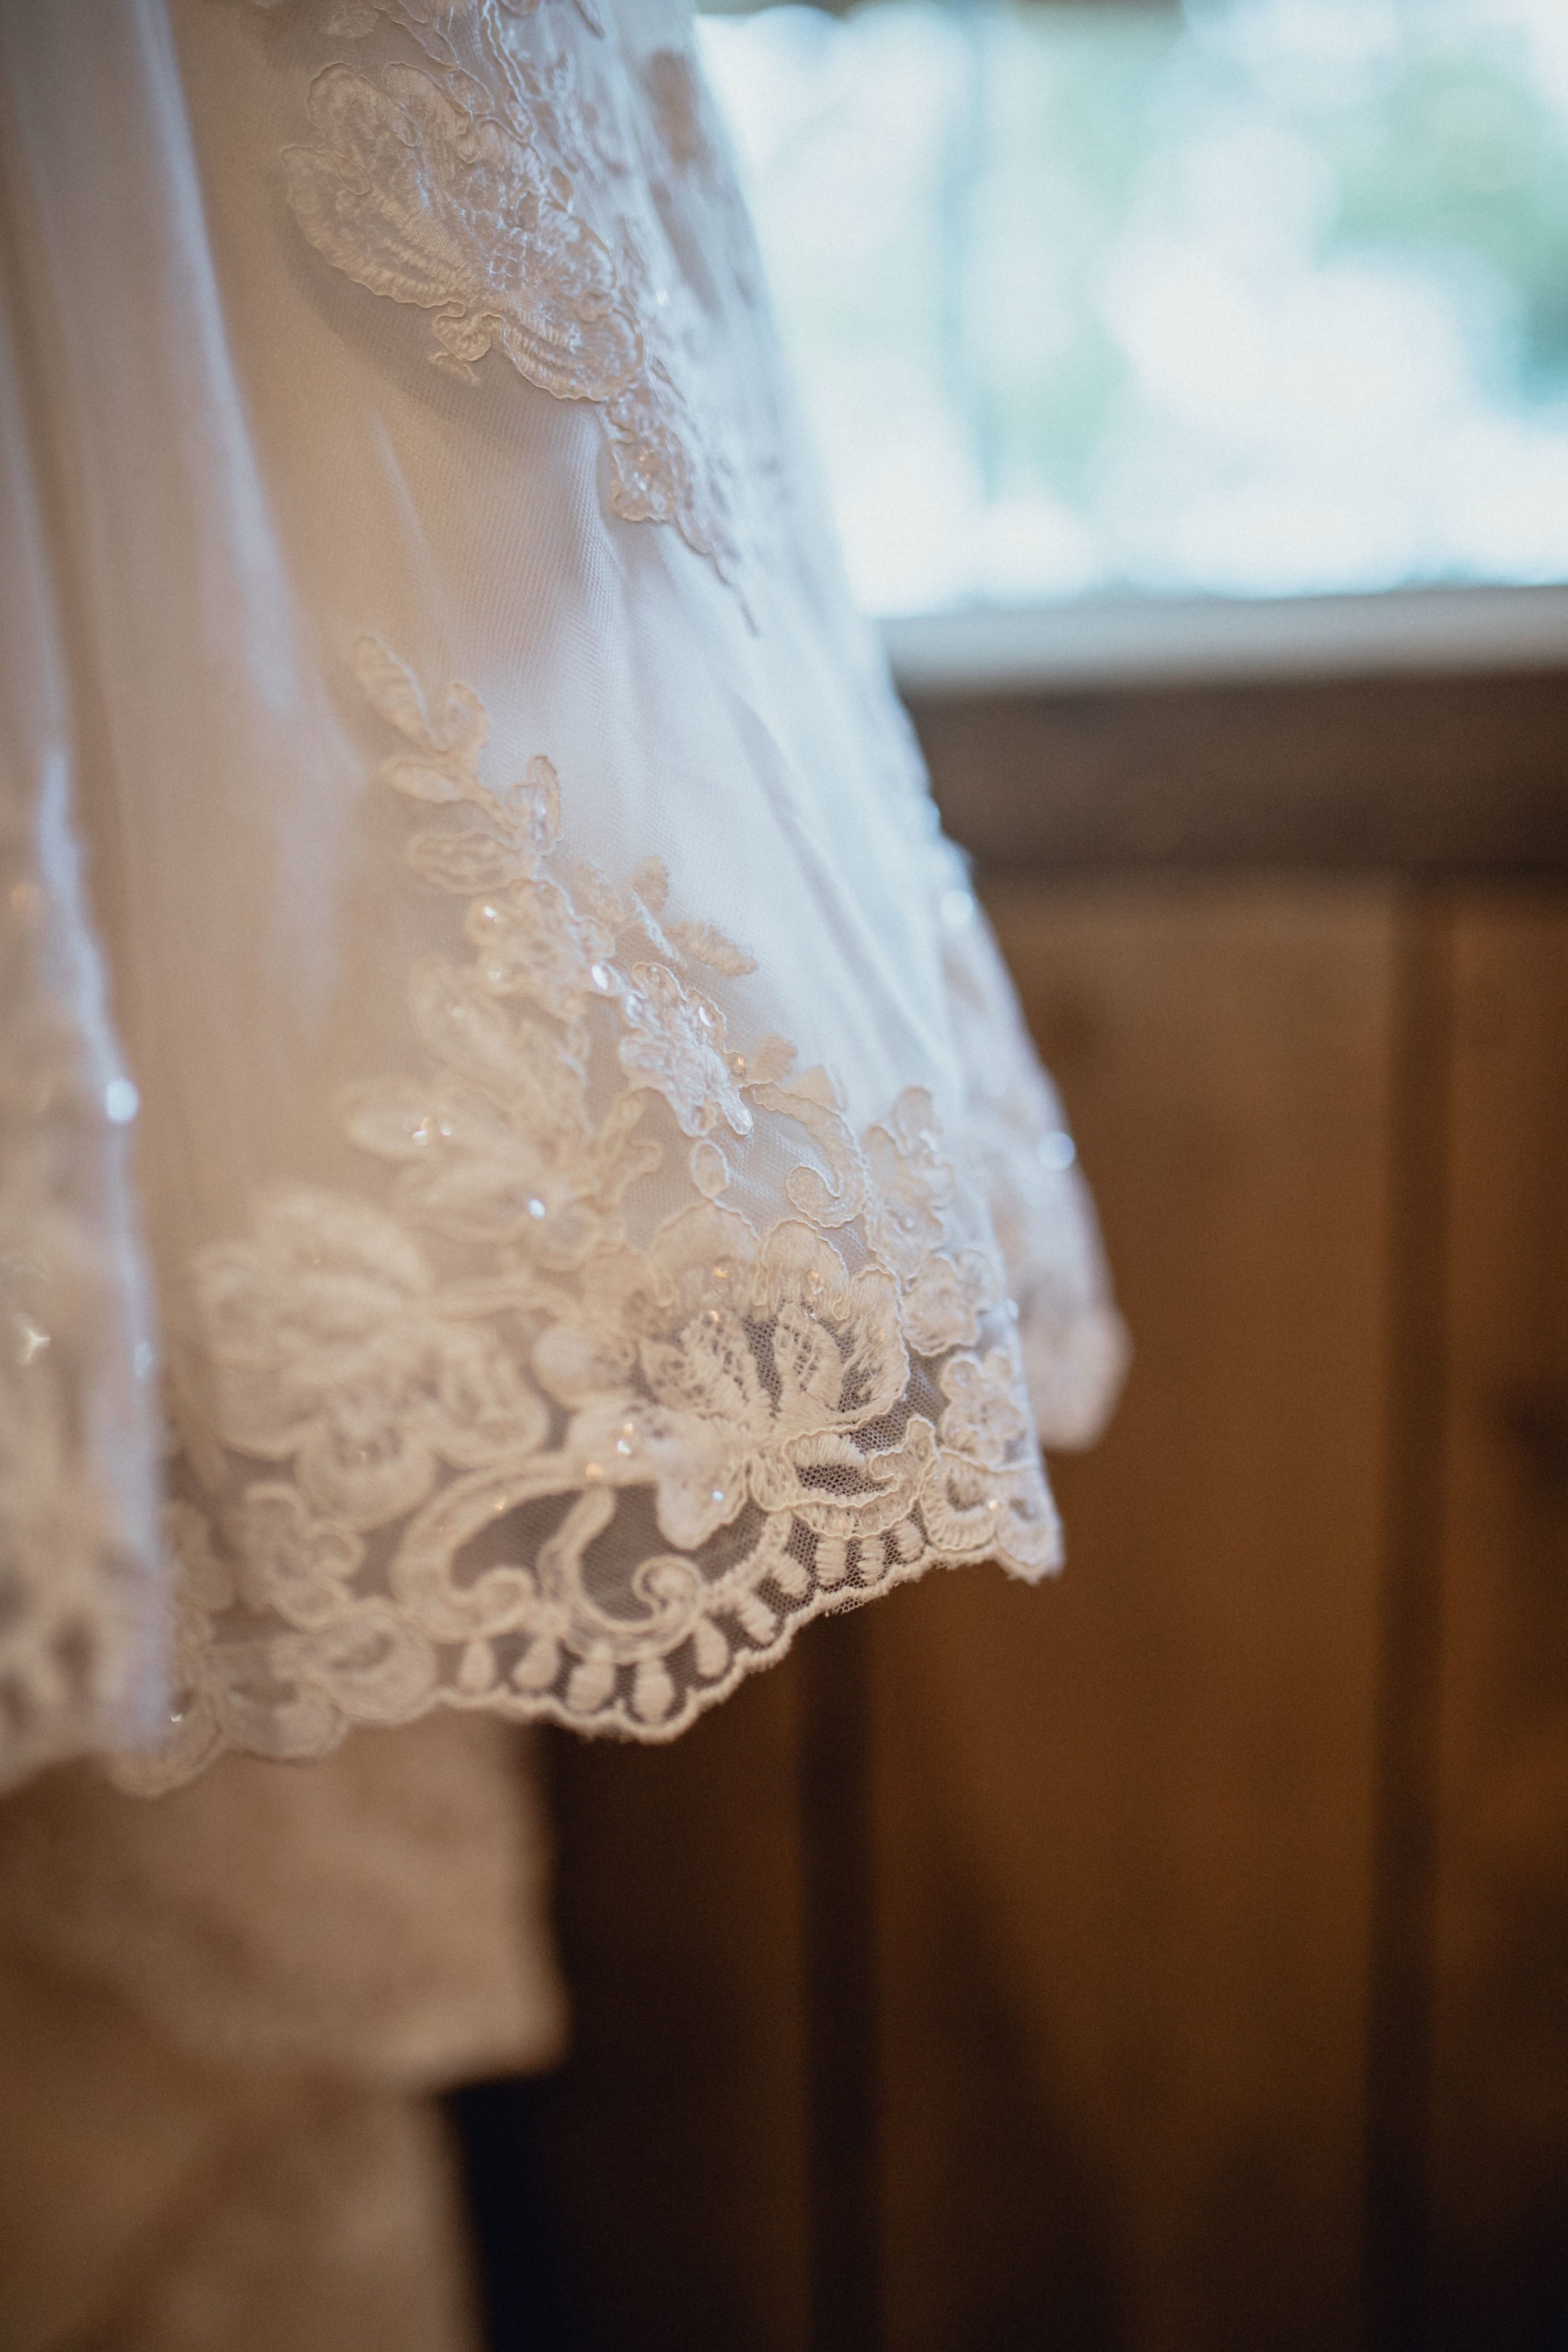 wedding-dress-details-closeup-at-RUSTIC-MANOR-1848.jpg